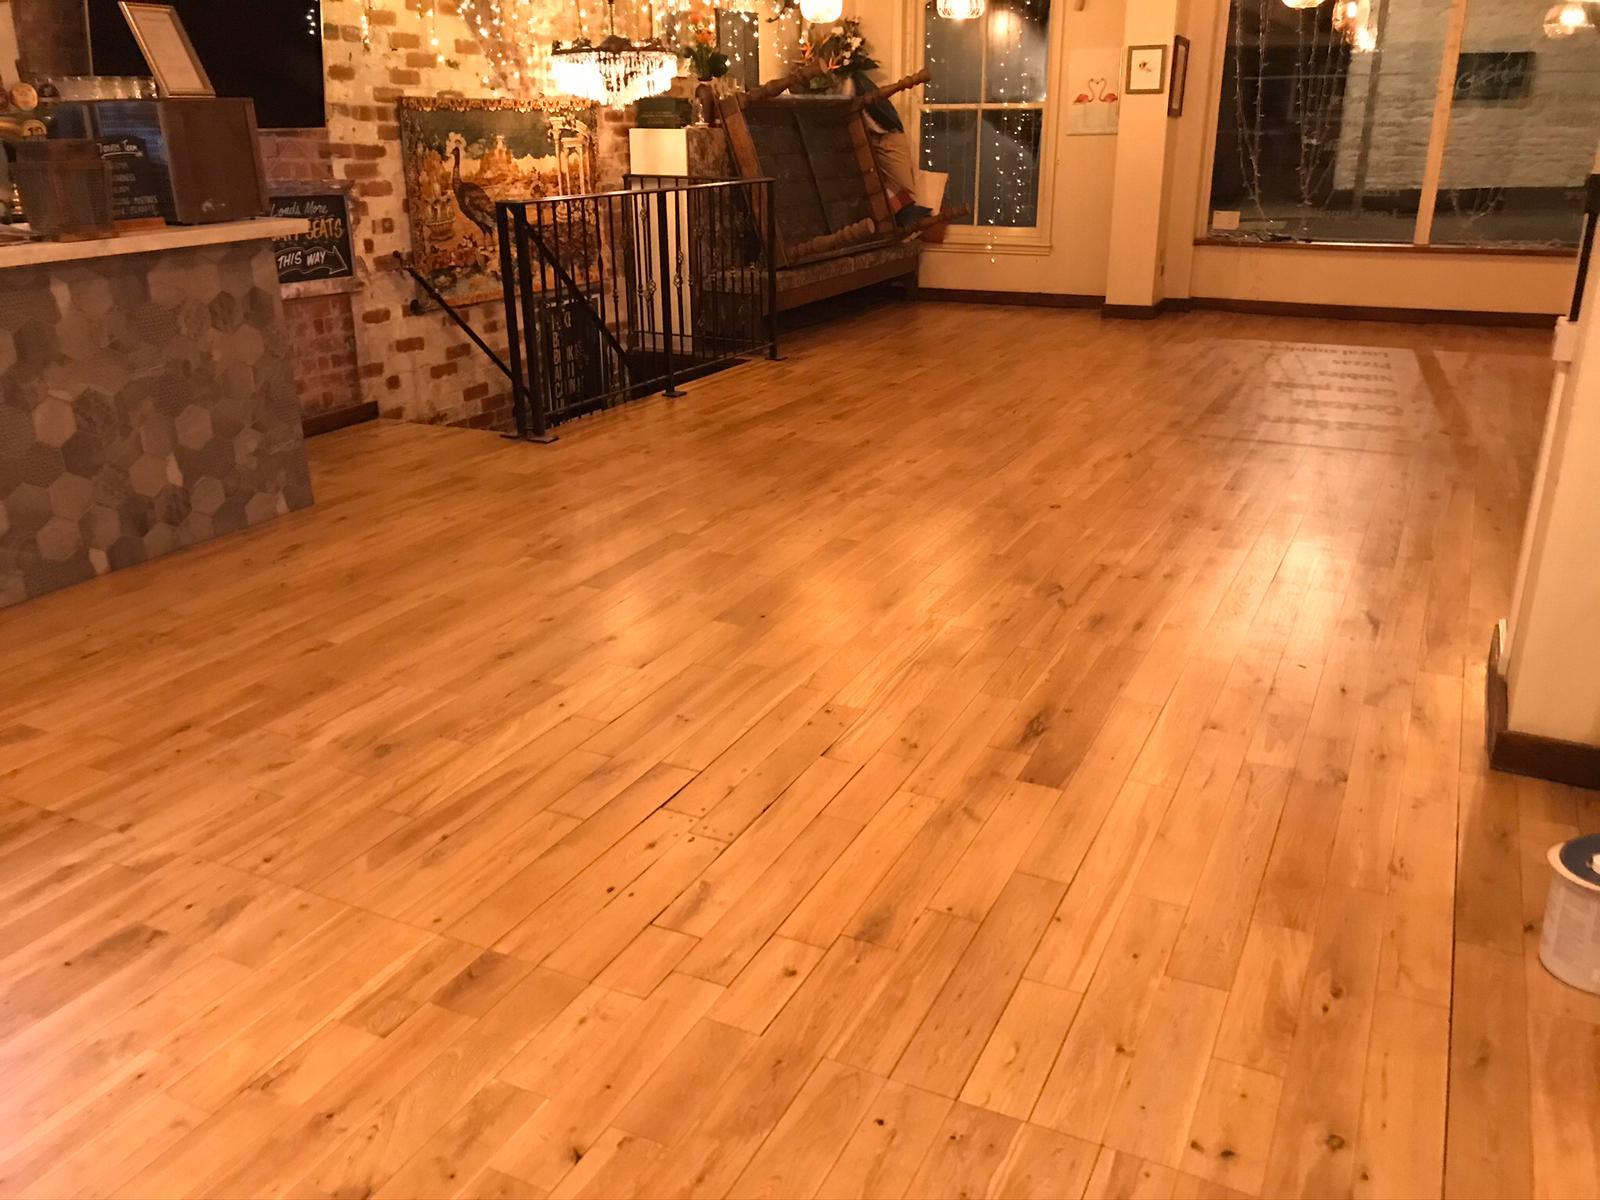 Tom Foolery Pub Floor Restoration